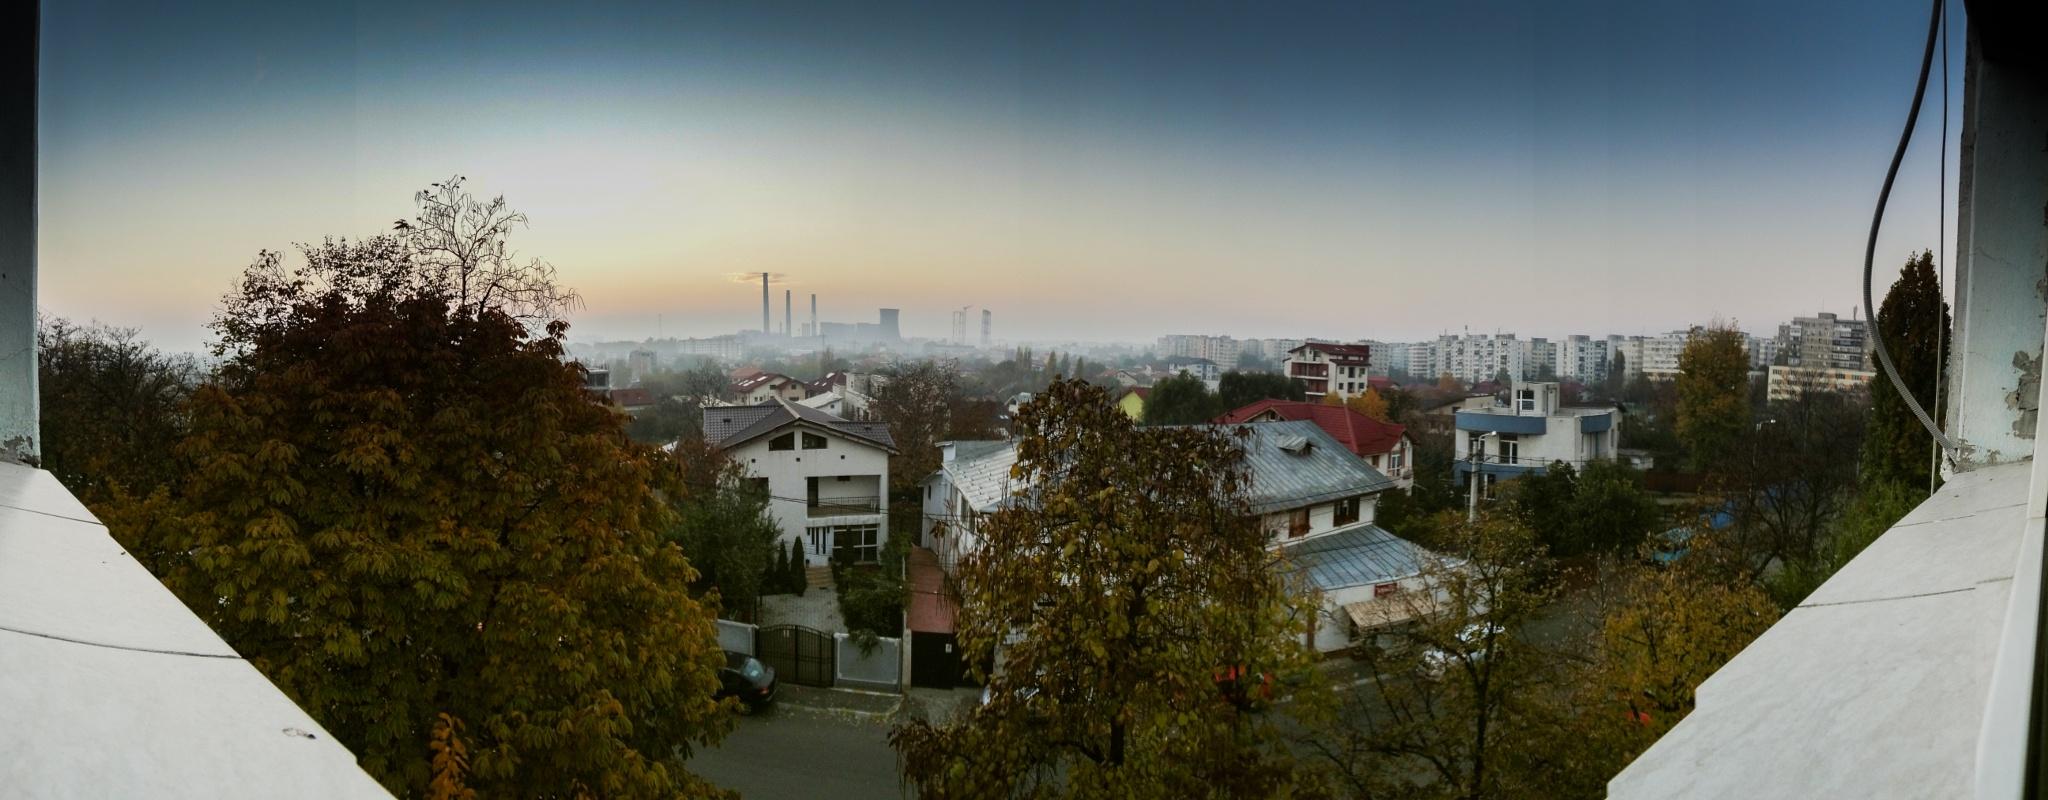 Bucharest   Panorama by Bogdan Birleanu